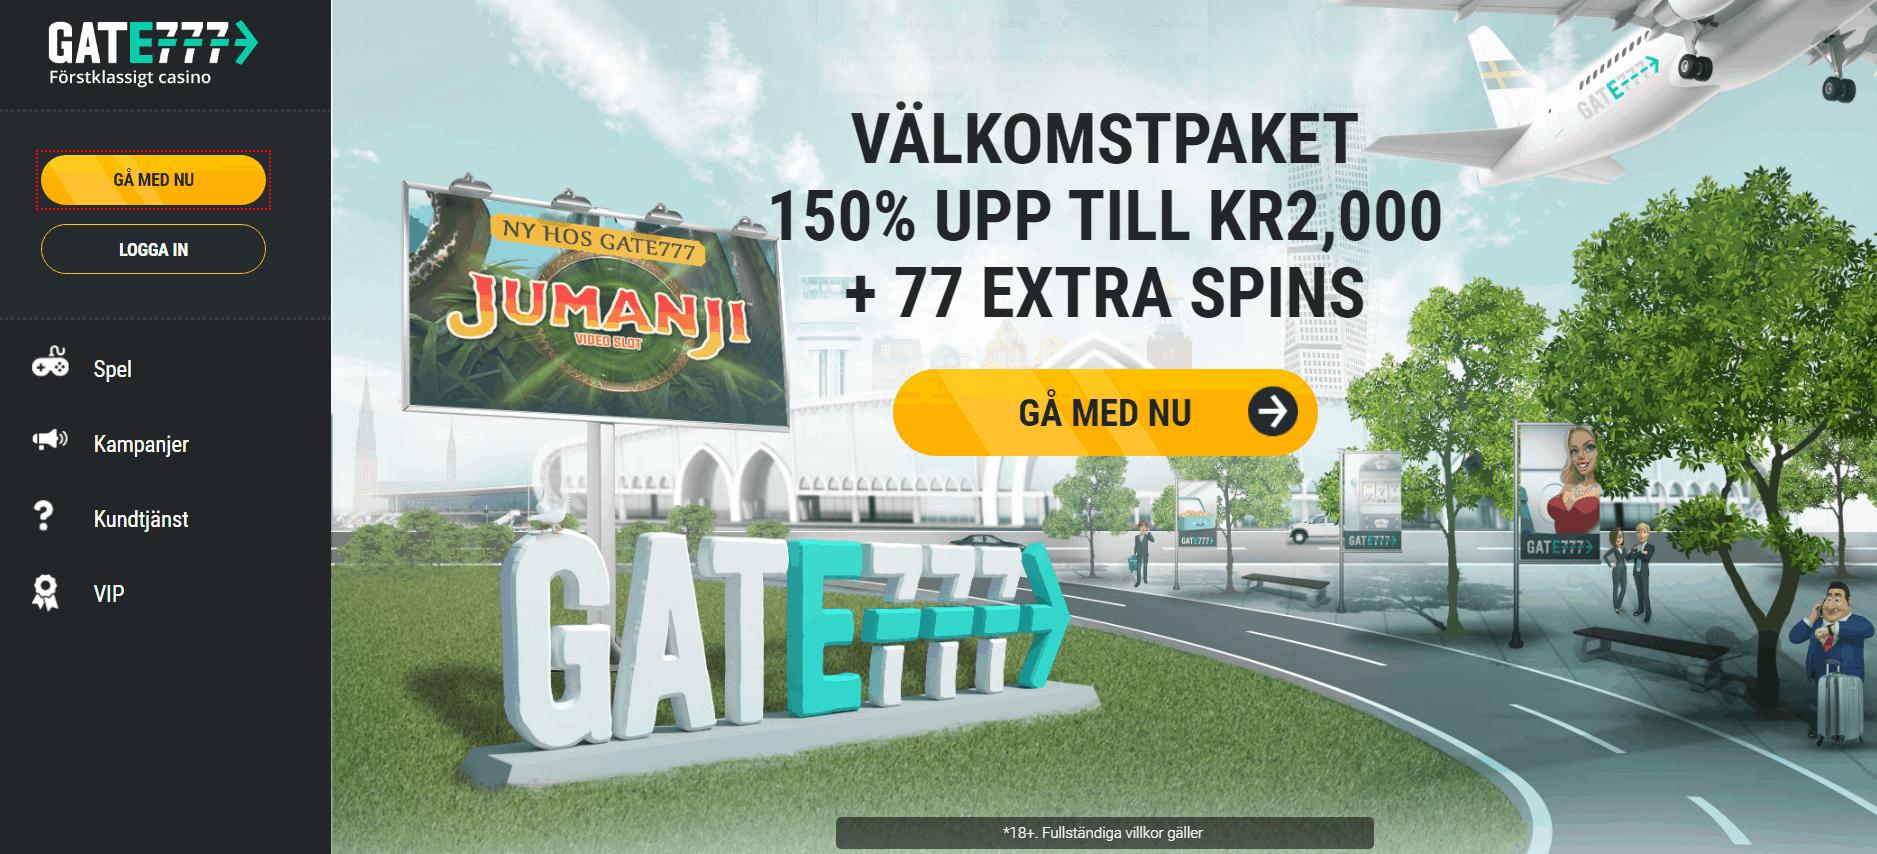 Casino stream 23626